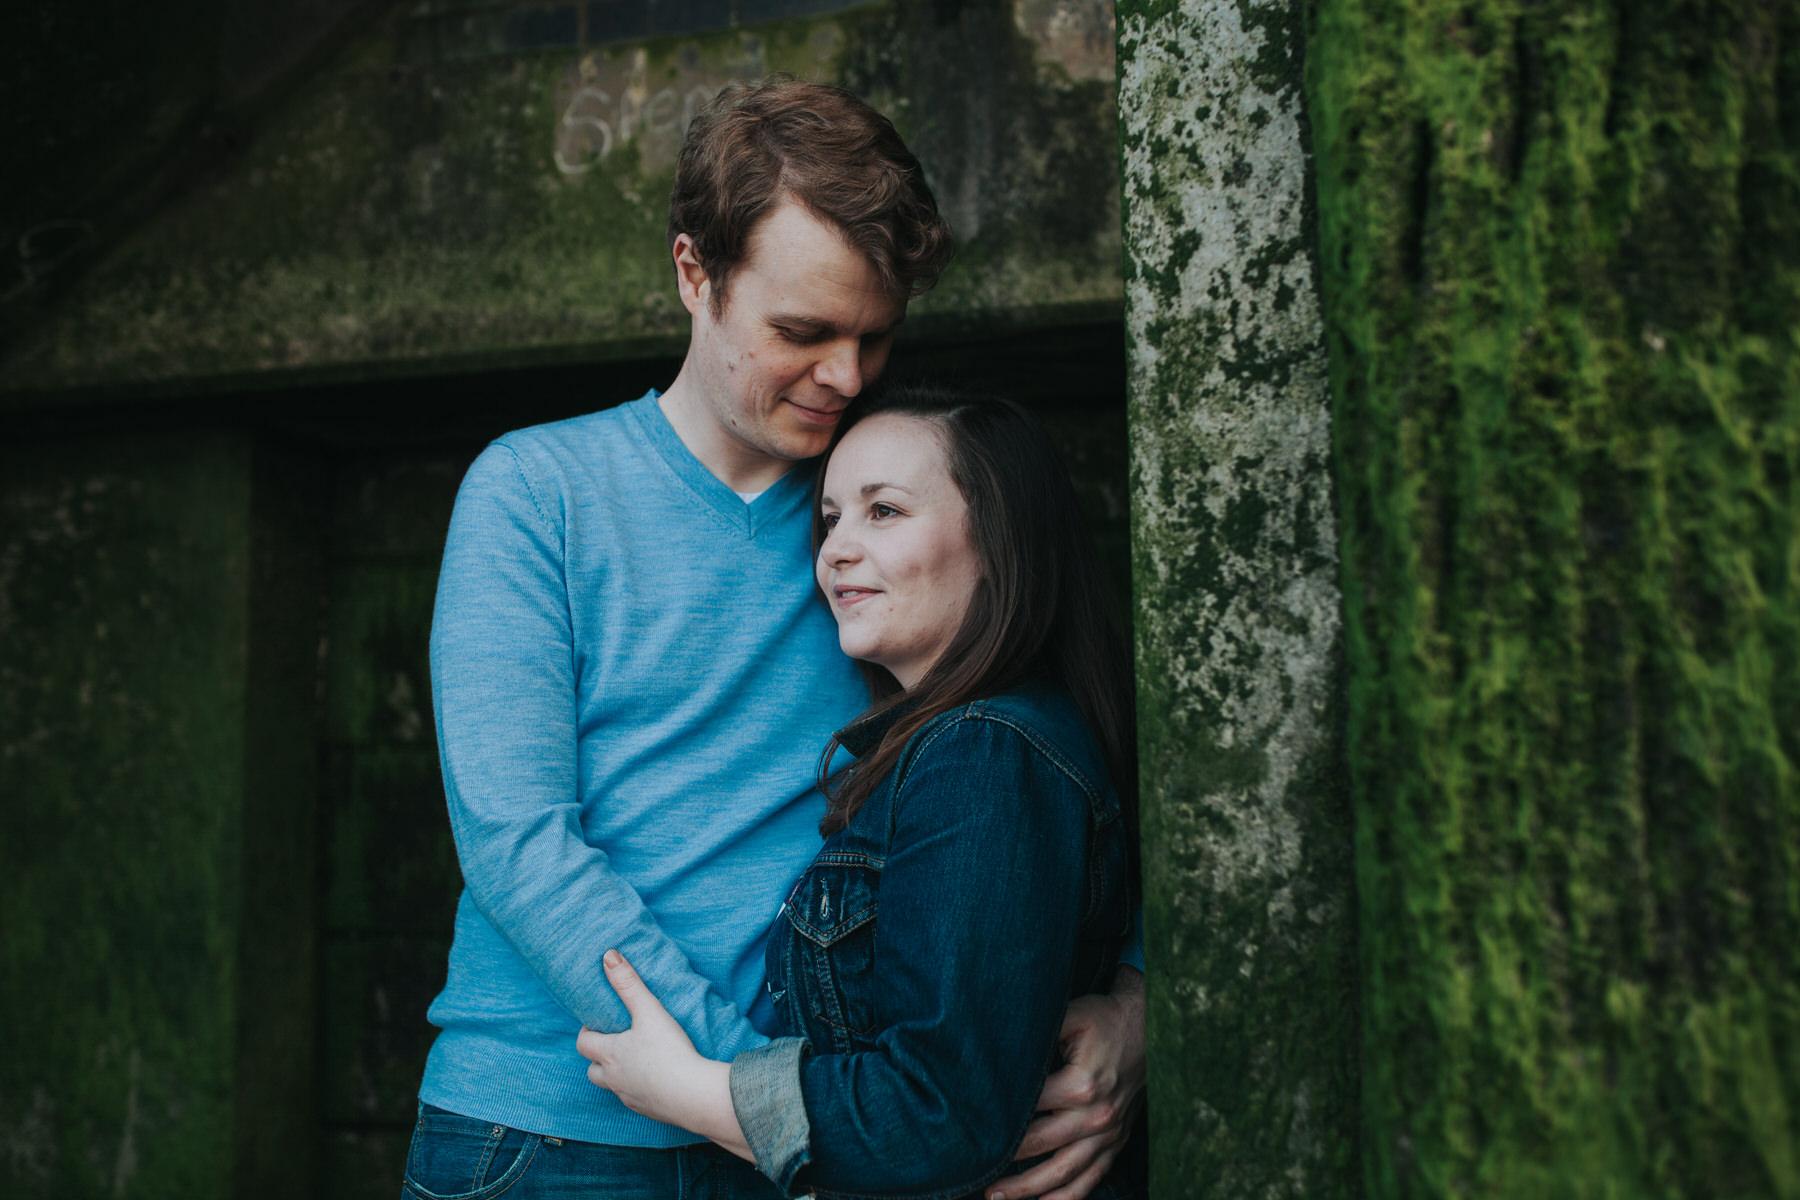 51-Quirky-engagement-London-romantic-pose-idea.jpg